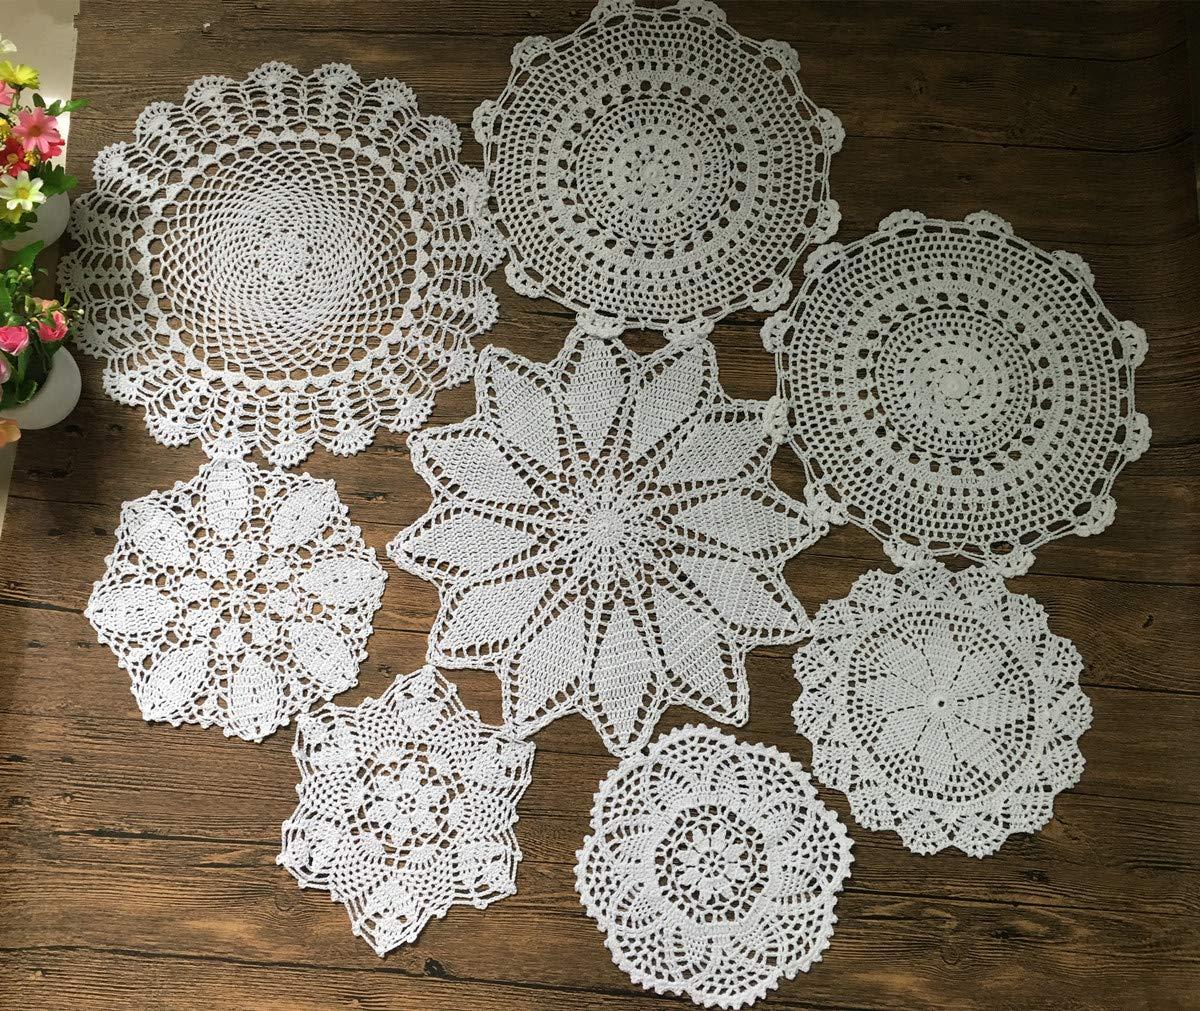 MindPlus Set of 8pcs 100% Cotton Hand Made Crochet Doilies 9-16 inches Round Crochet Lace Doily White Wedding Decorate Hight Tea by Mindplus